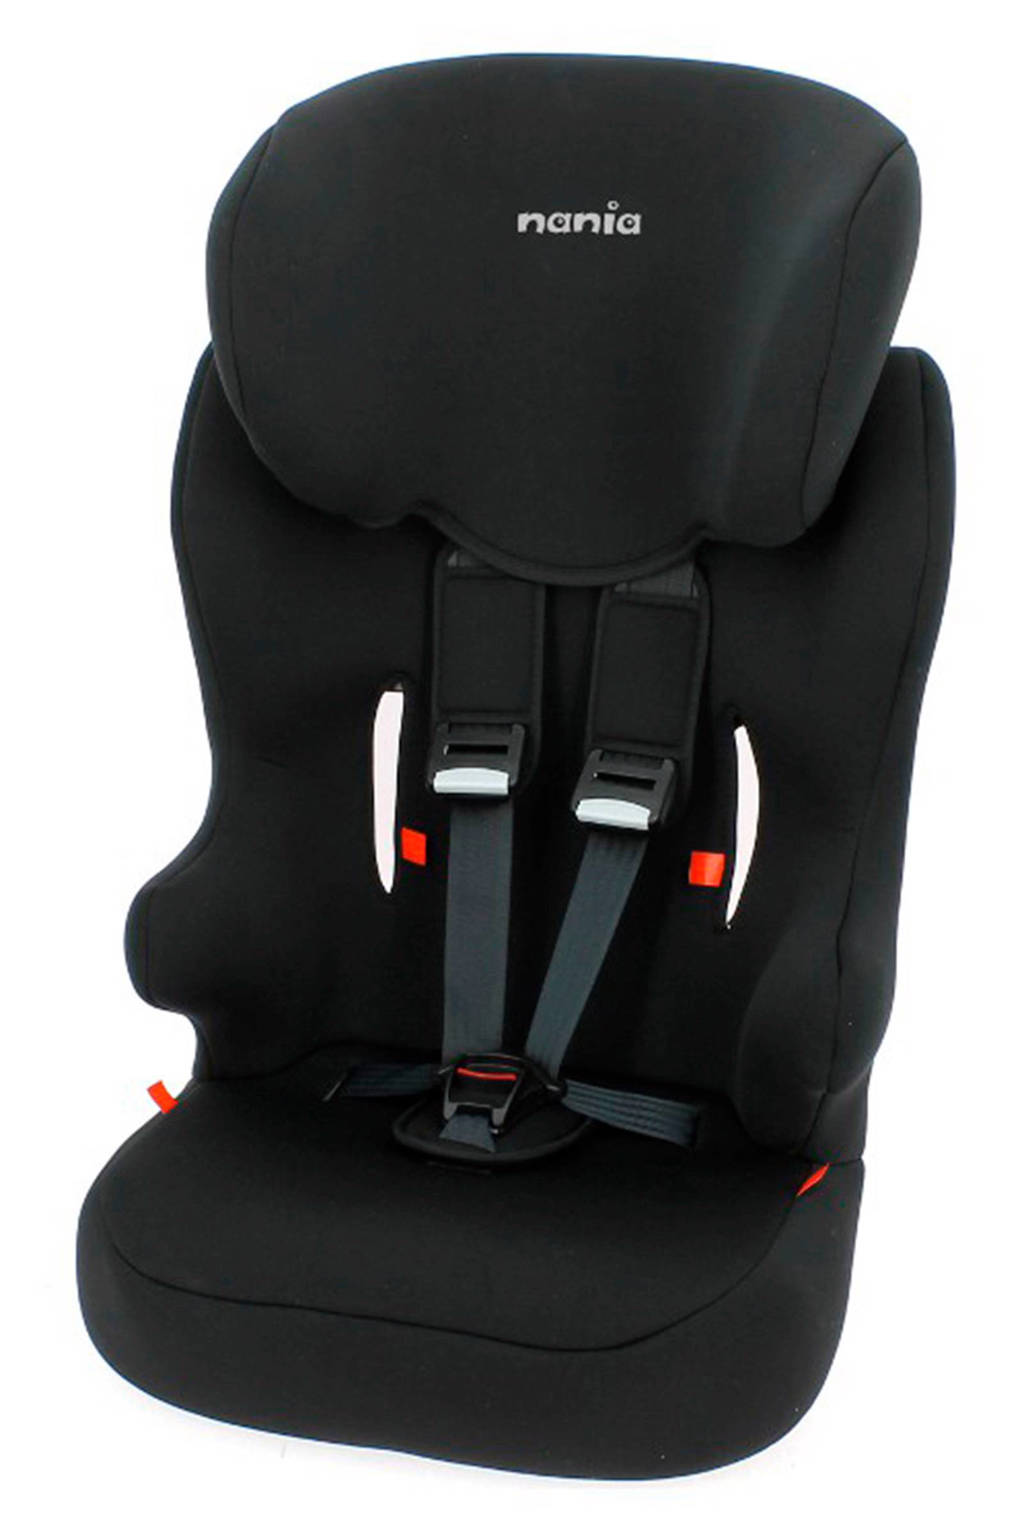 Nania Racer SP autostoel (9-36 kg) zwart, Zwart, 1-2-3